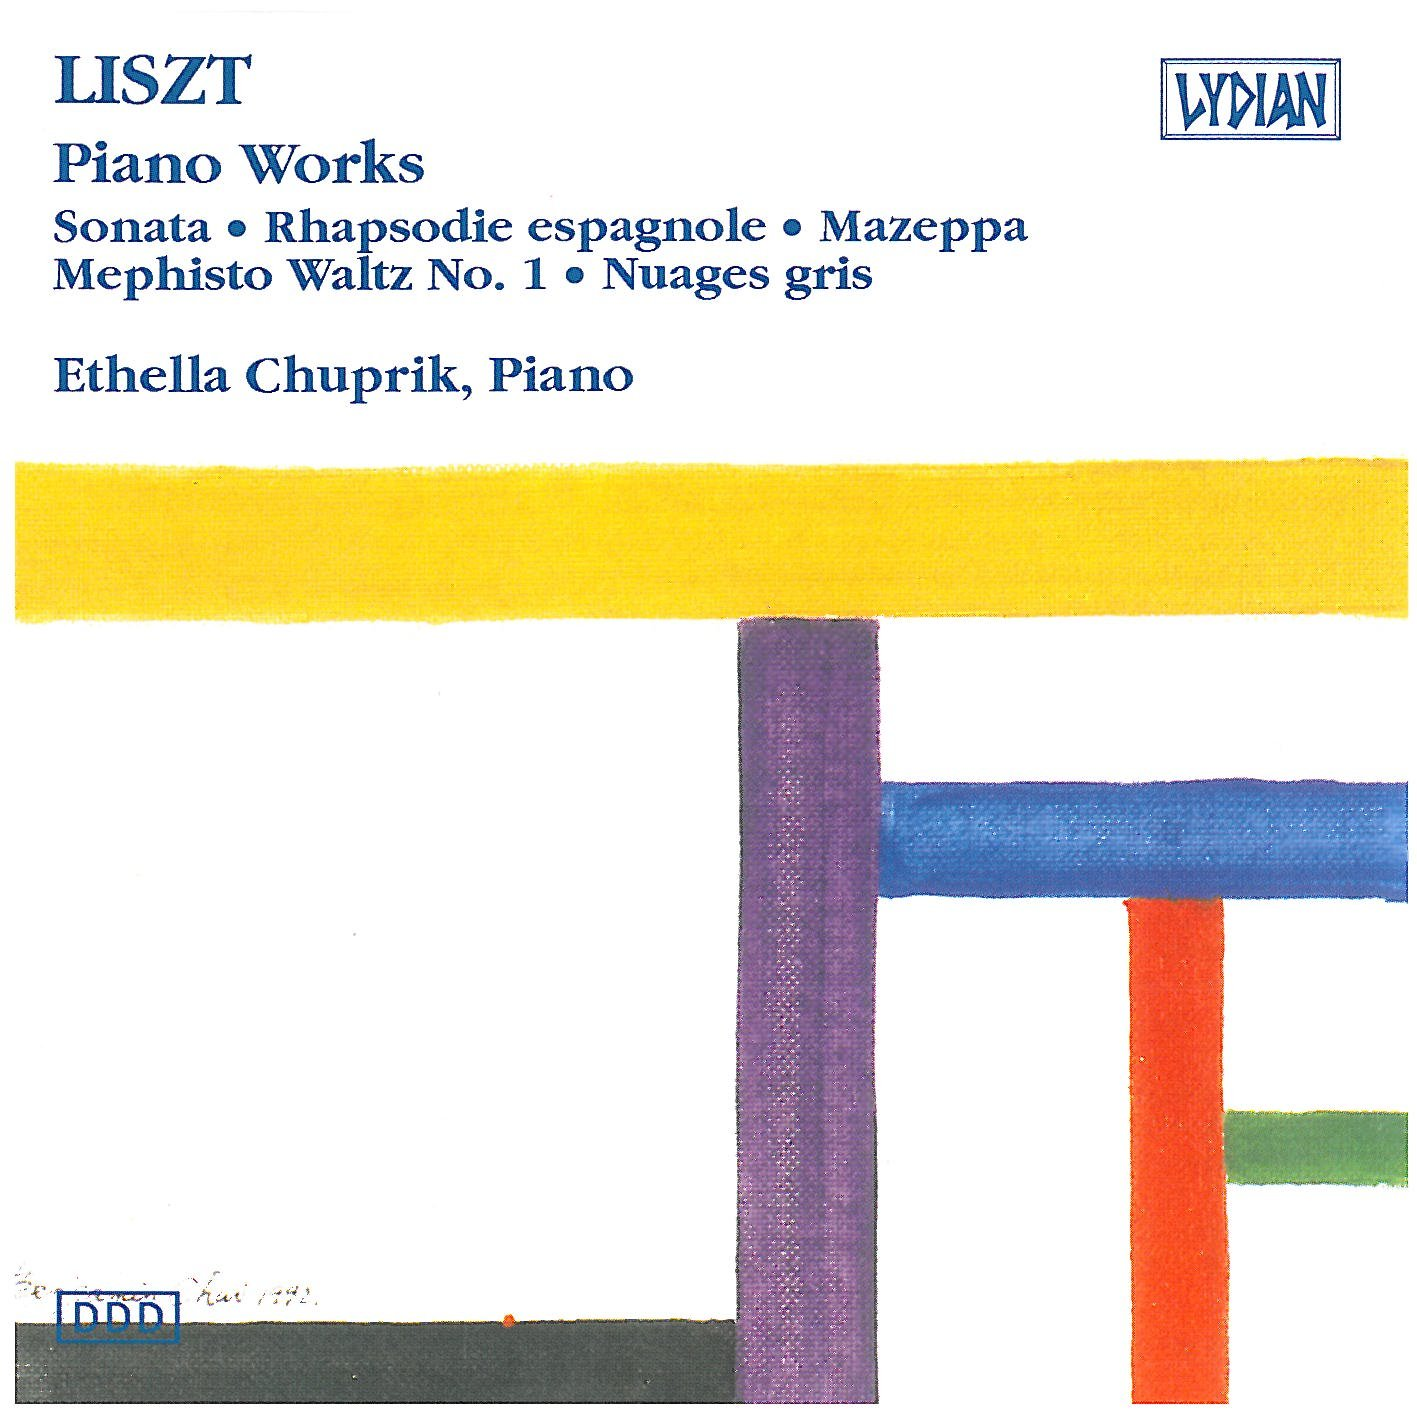 Franz Liszt: Klavierwerke: Ethella Chuprik, Franz Liszt: Amazon.es ...